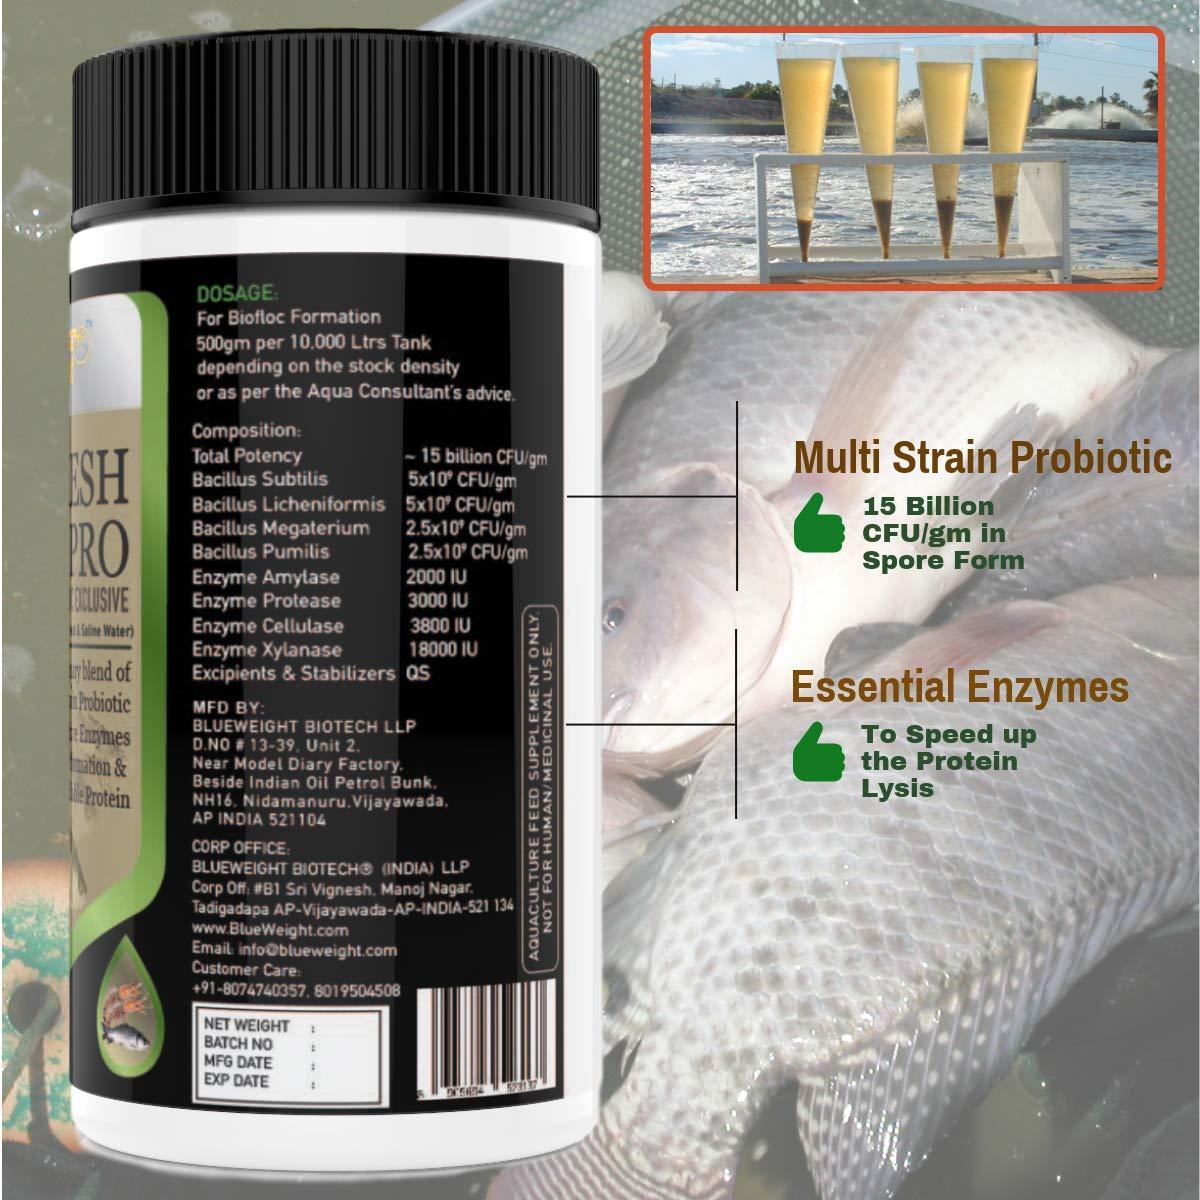 BLUEWEIGHT Everfresh Pro Aqua Probiotics, Multi Strain Probiotic 15b  CFU/gm, 500 G